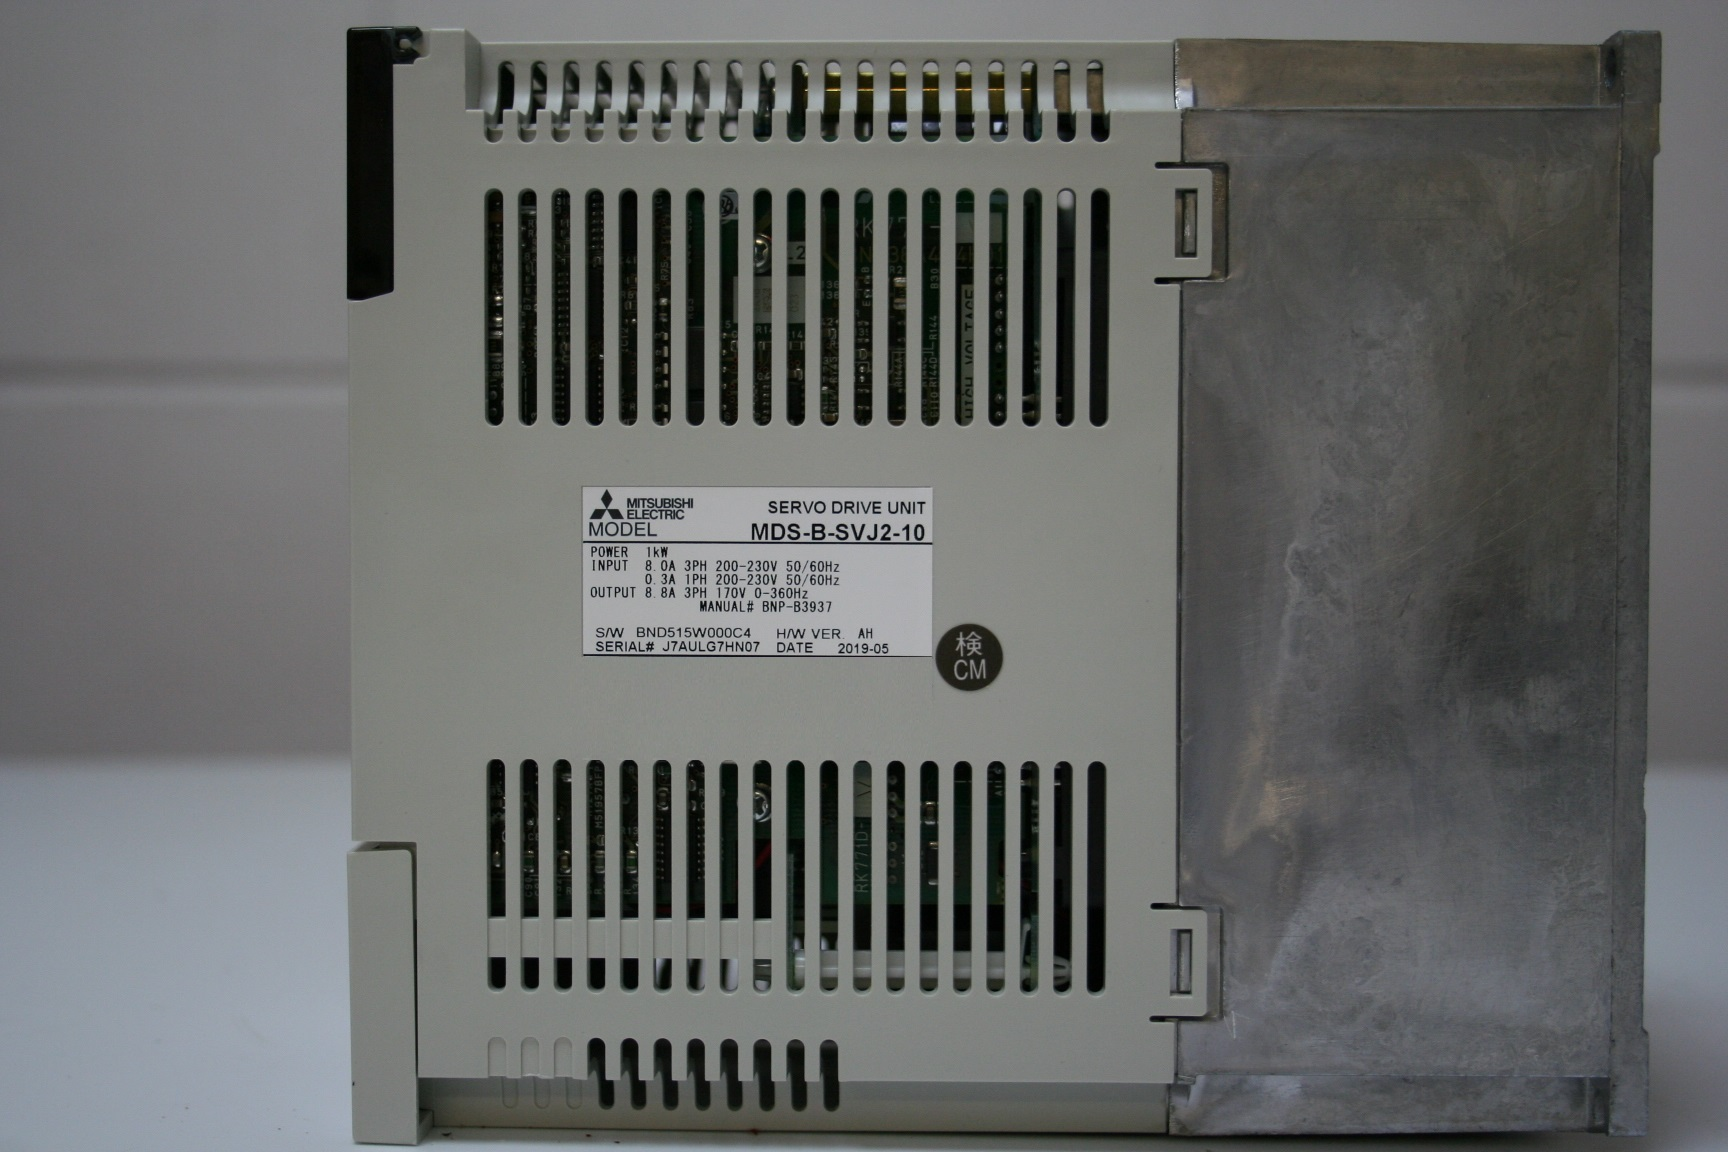 Mazak Mitsubishi Servo Drive Unit Mds-B-SVJ2-10 c